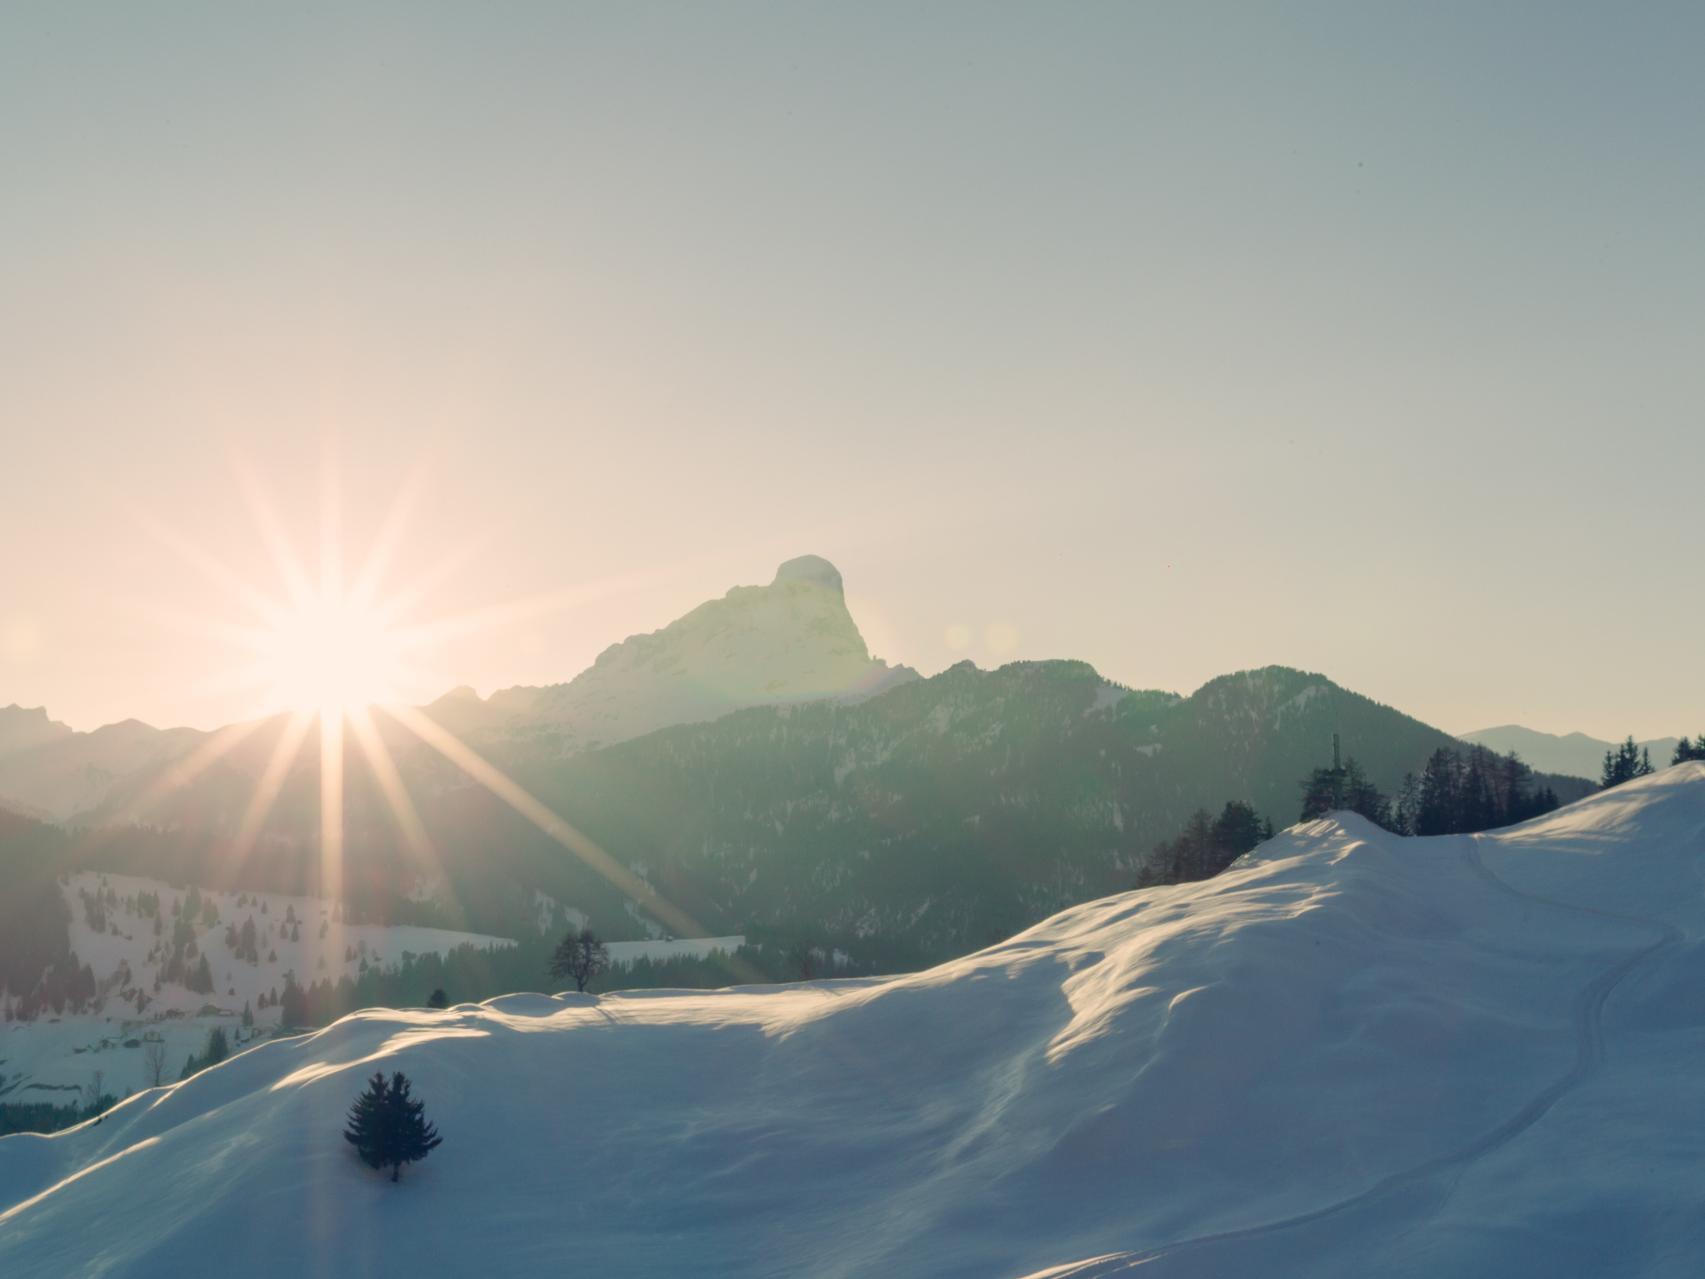 Snowshoe Hike Spëscia – Sas dla Crusc/Sasso di Santa Croce